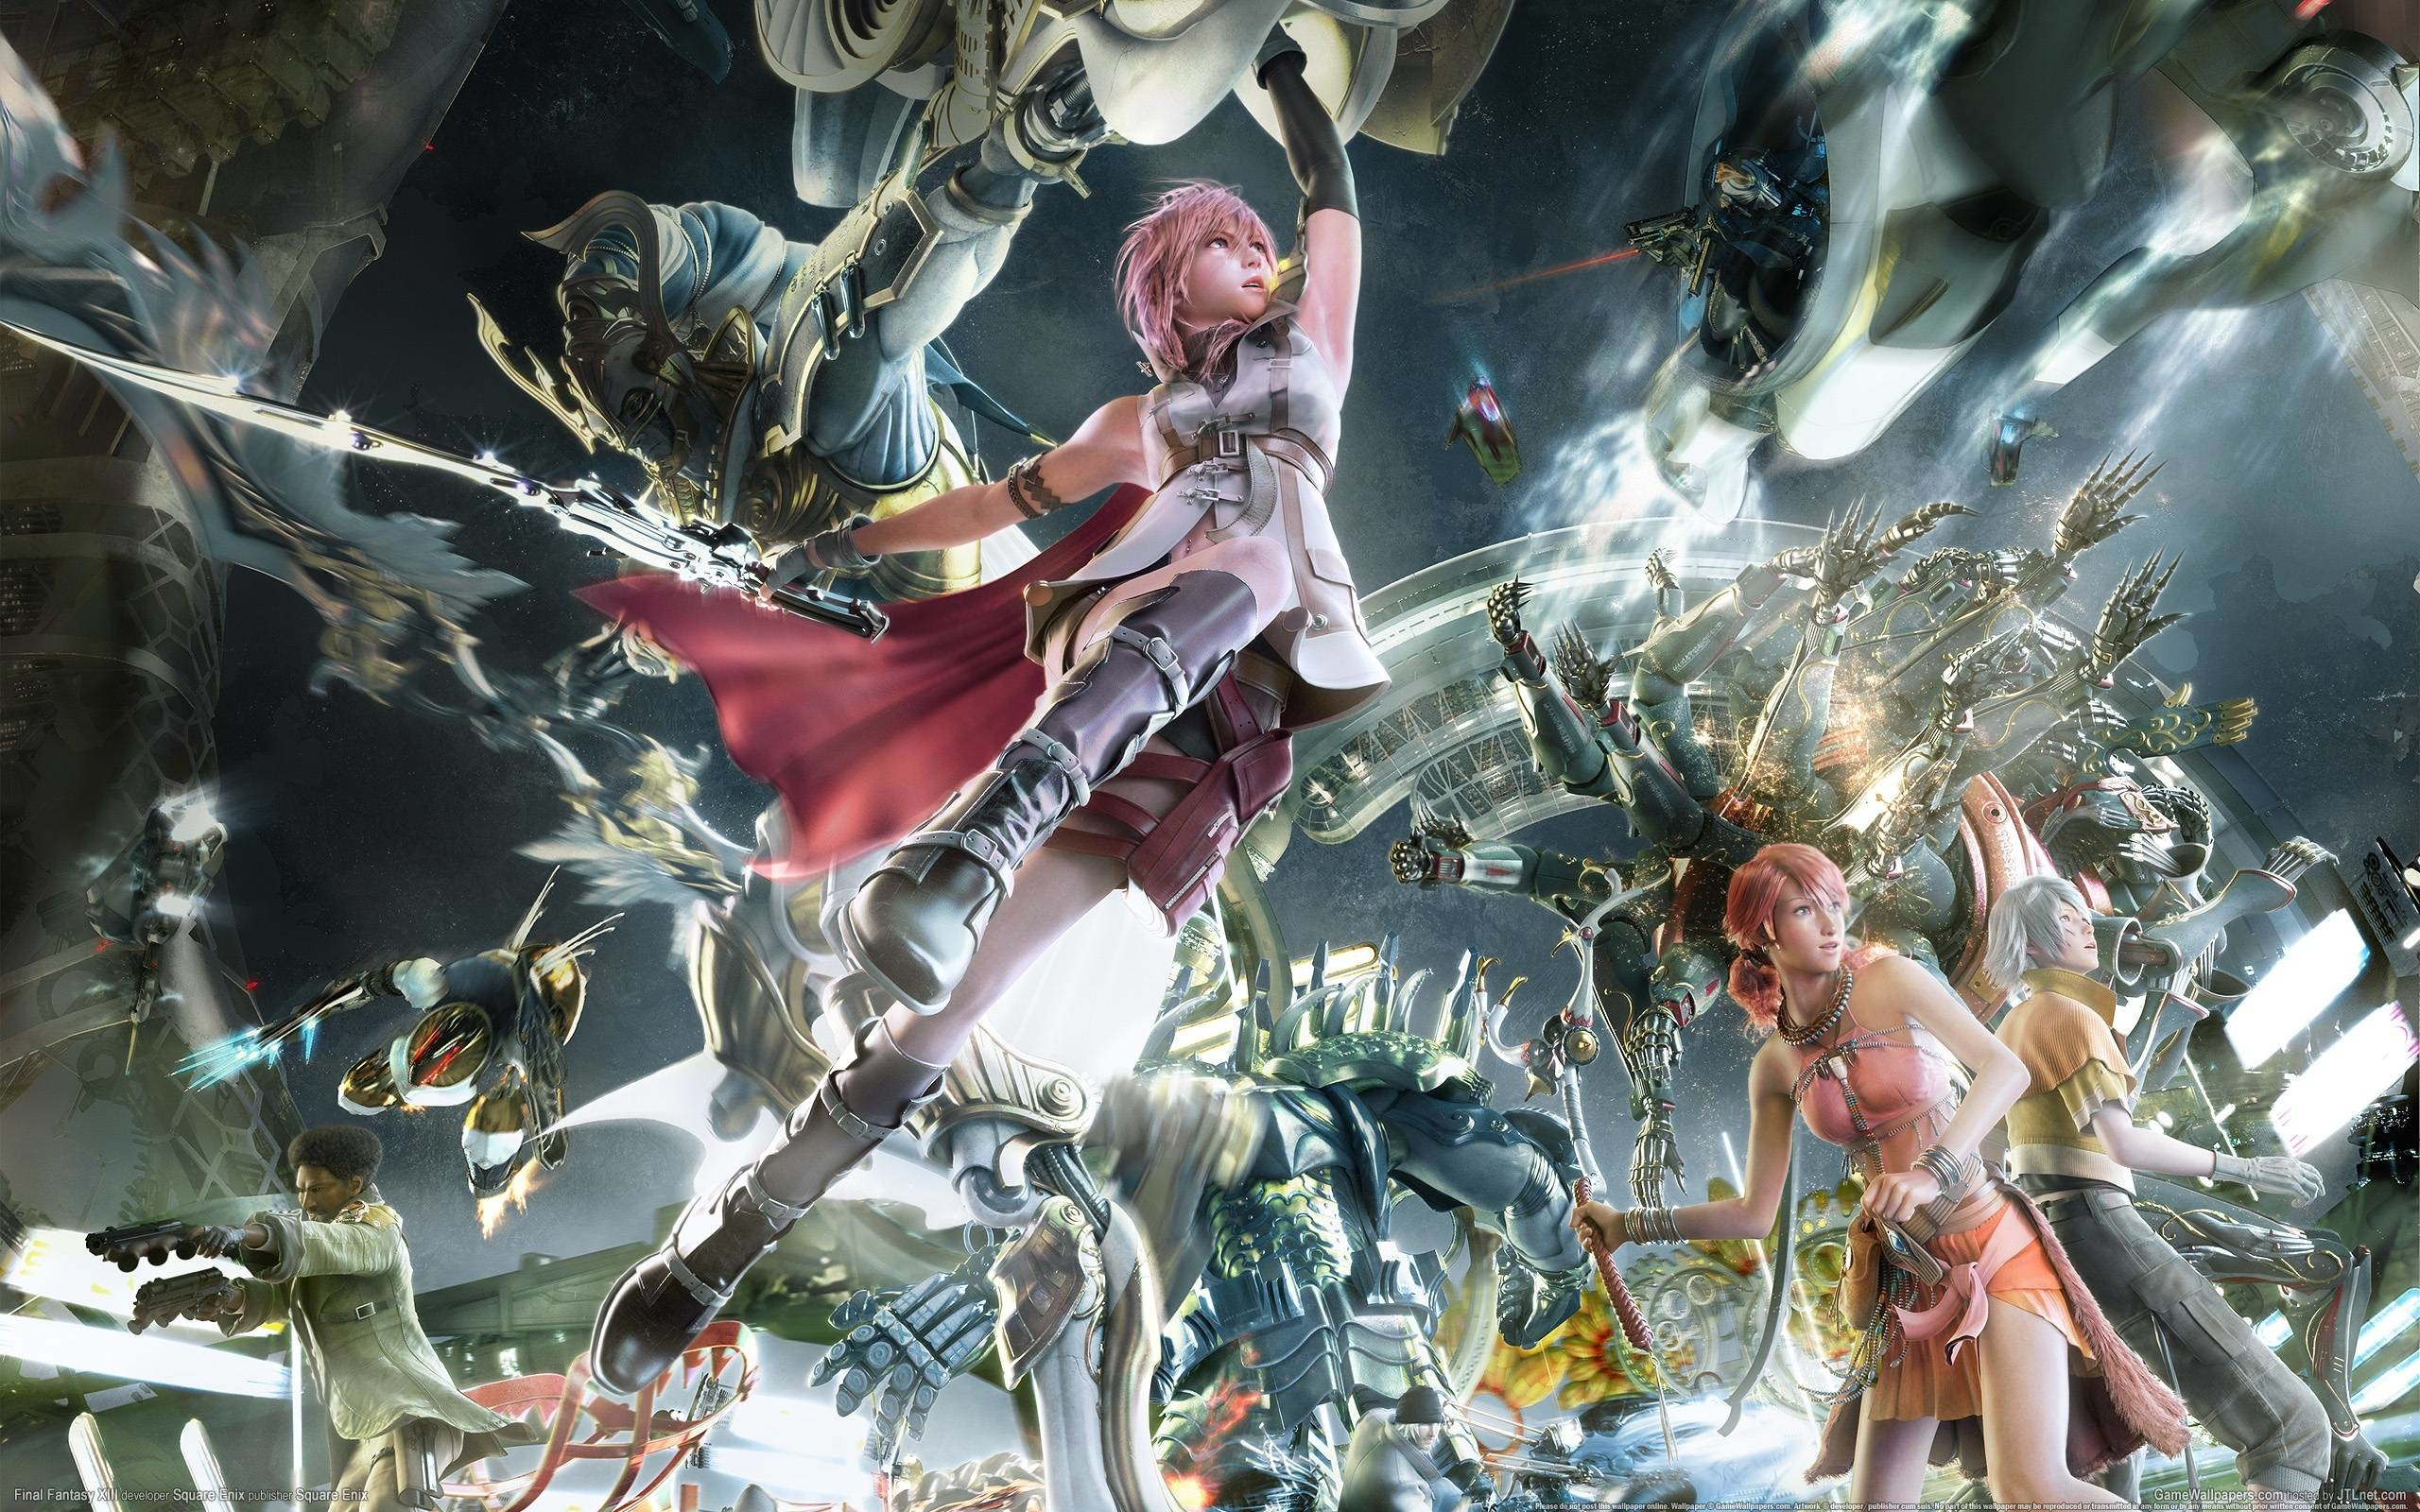 Final Fantasy Xiii Wallpapers – Full HD wallpaper search